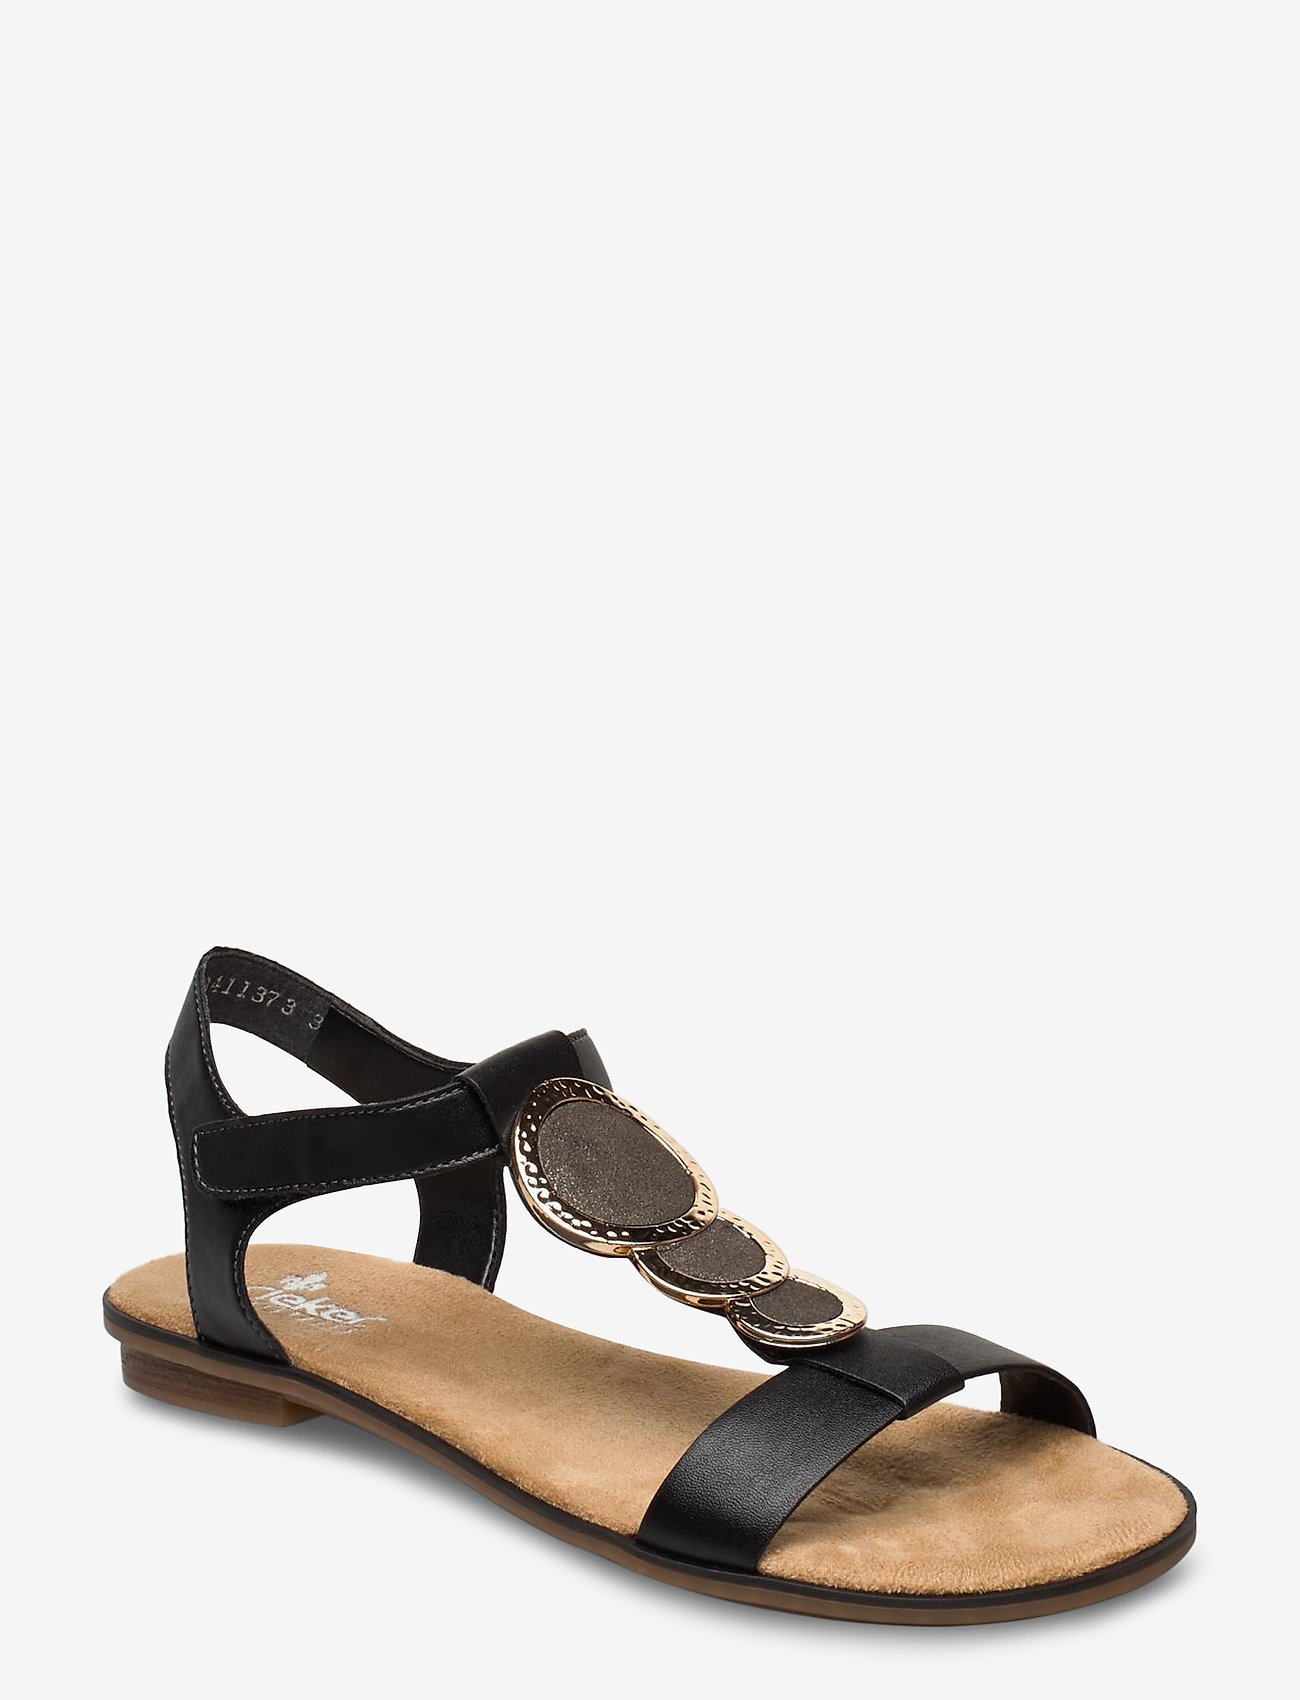 Rieker - 64278-00 - flat sandals - black combination